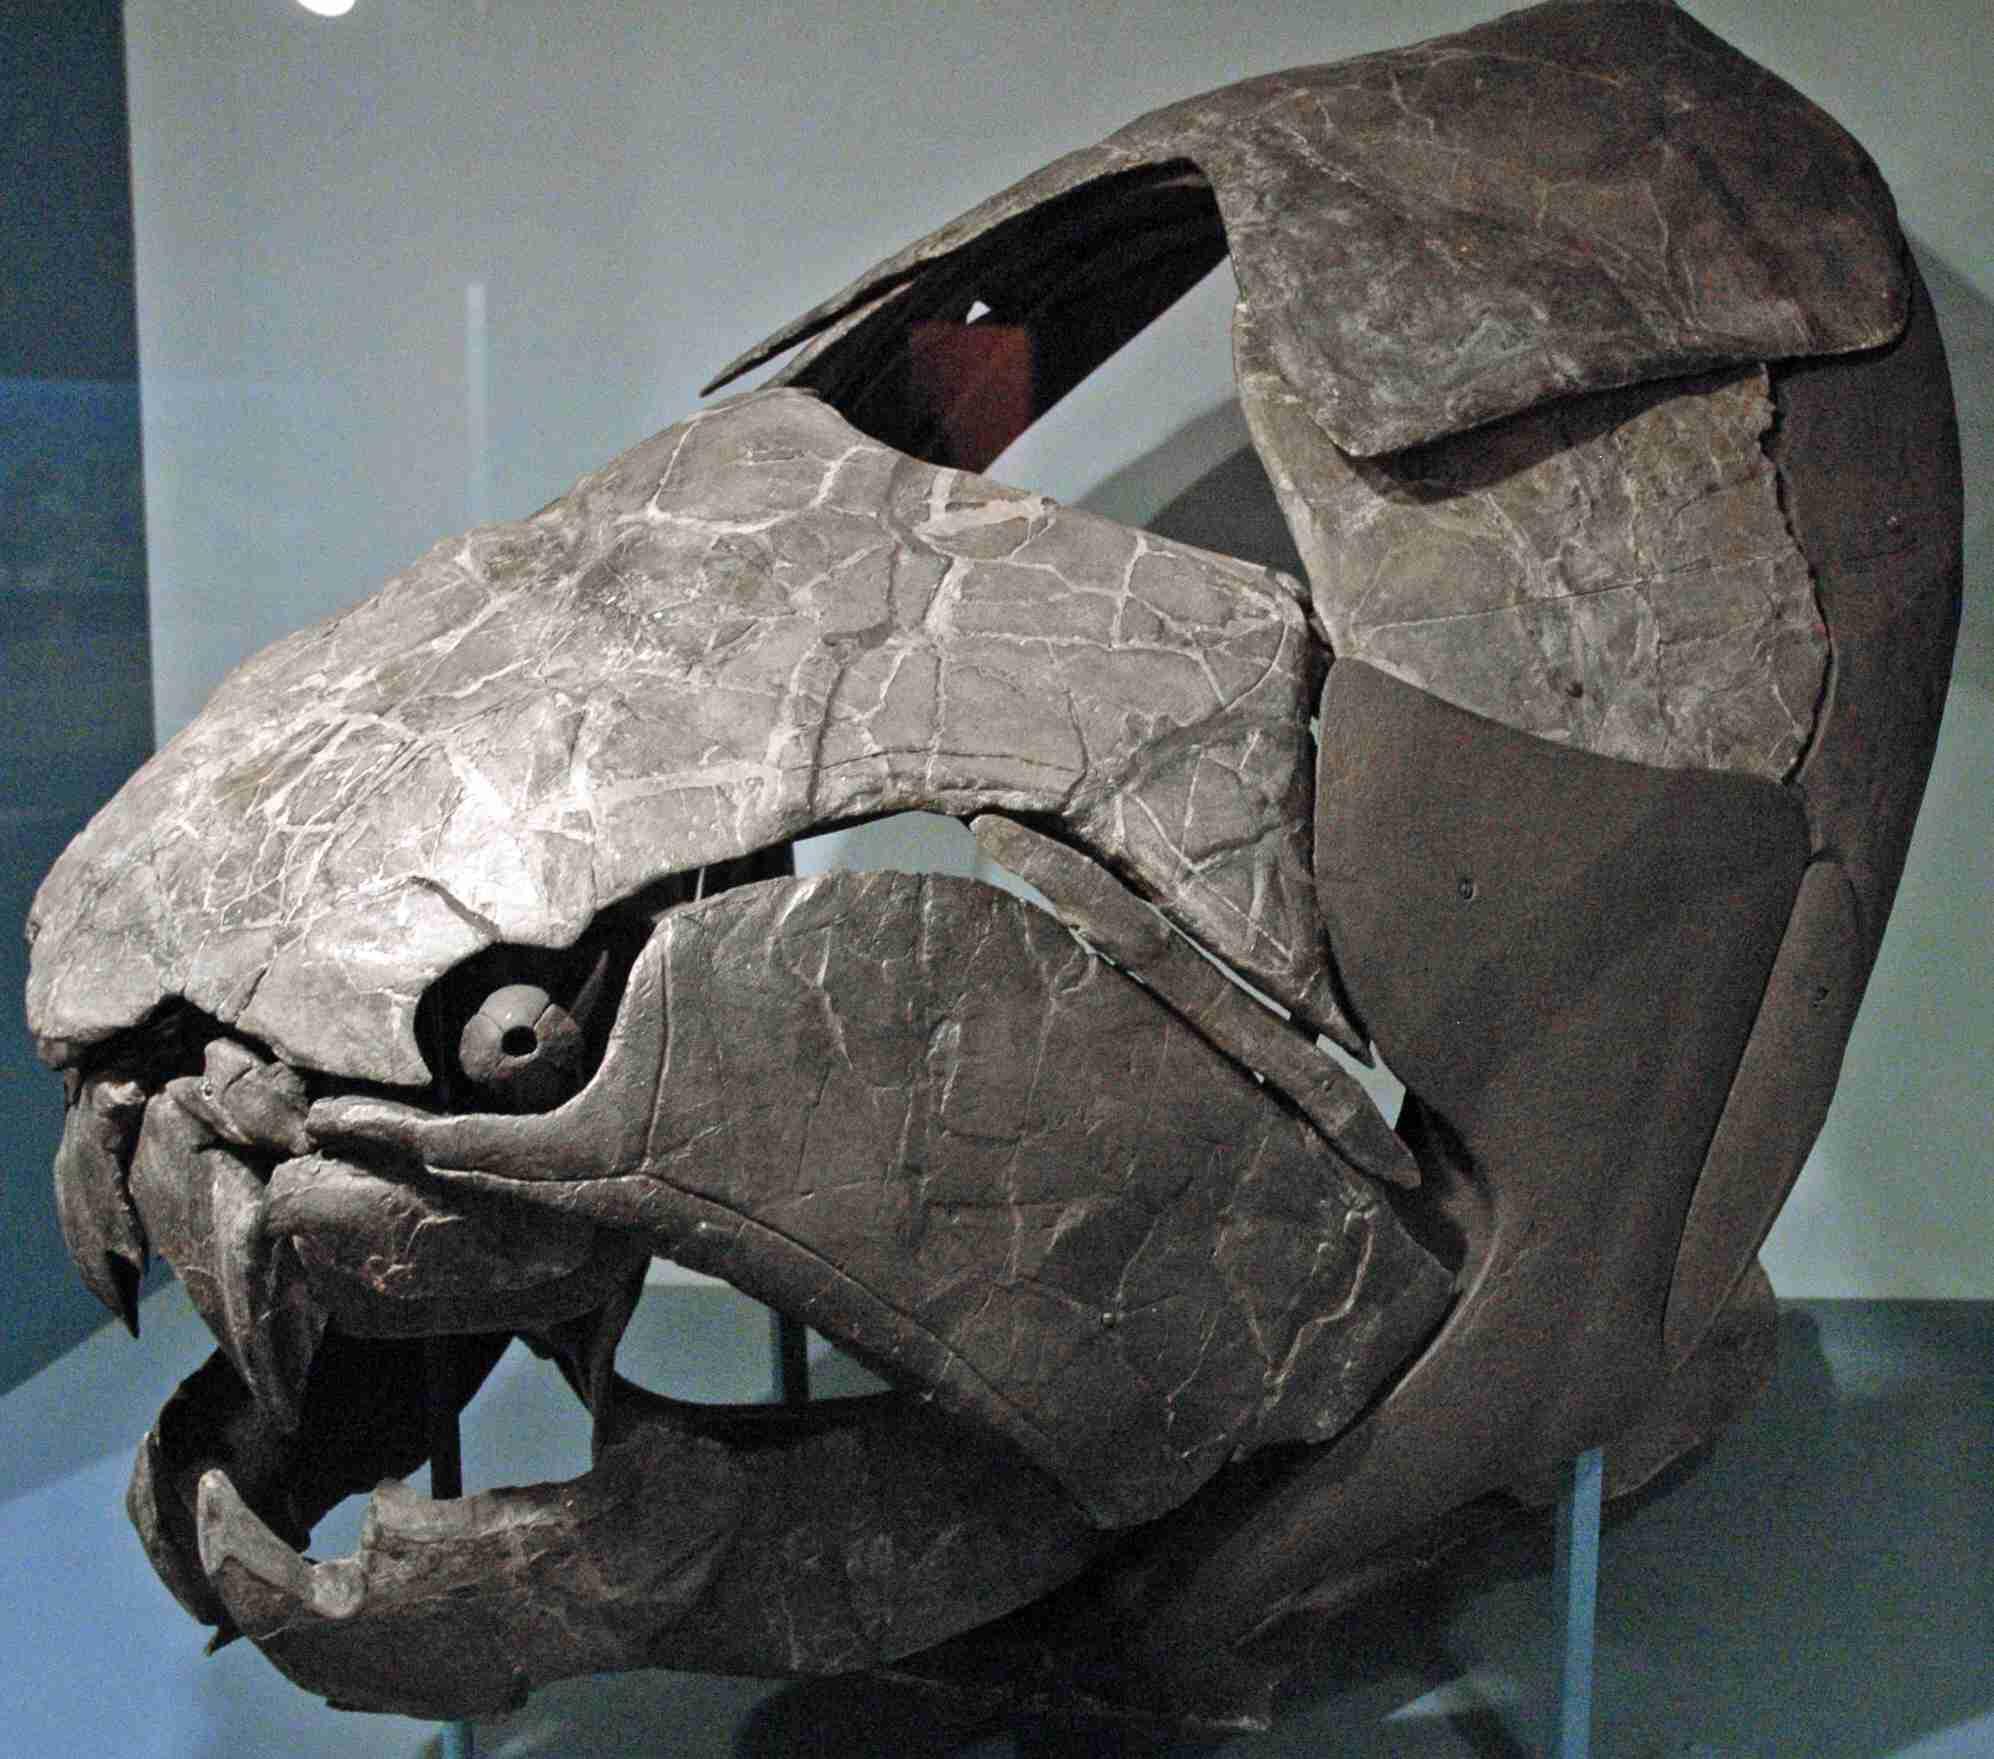 Dunkleosteus terrelli (fossil fish)